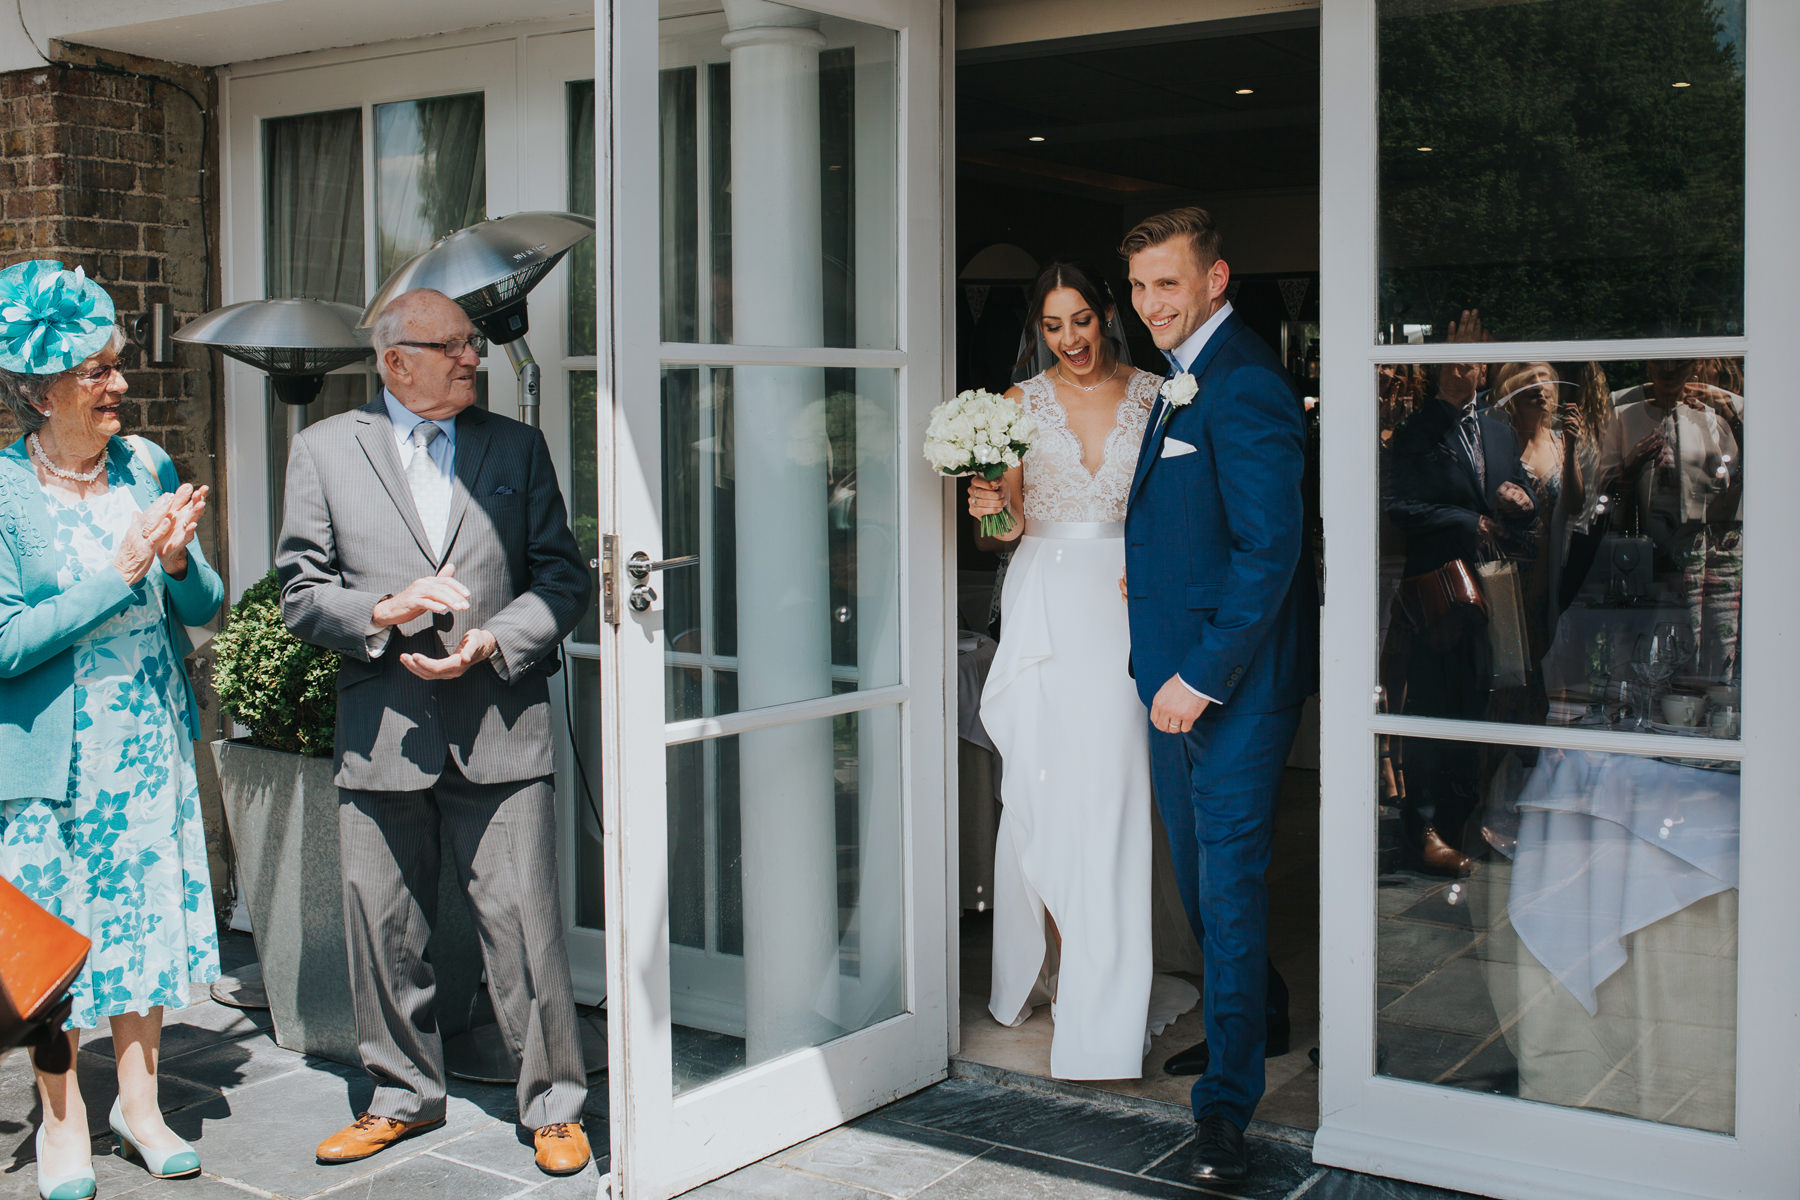 CRL-219-The Bingham Wedding Richmond-groom bride guests blowing bubbles.jpg